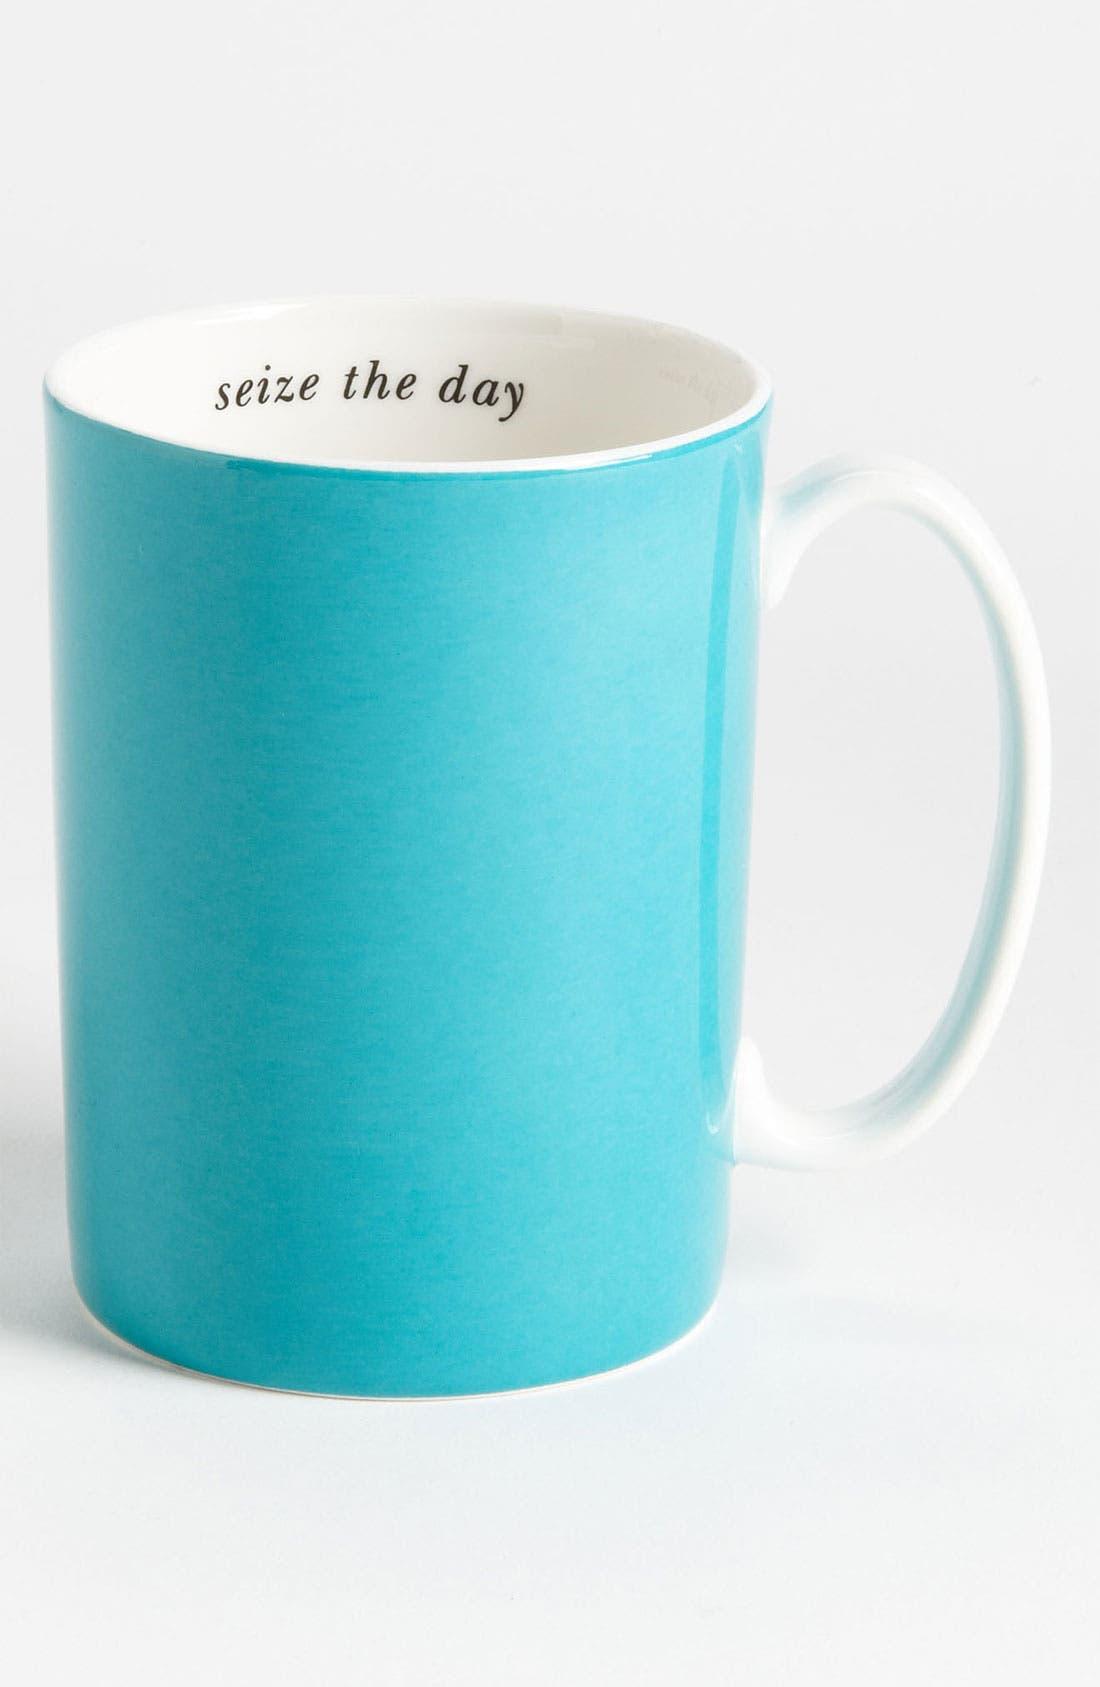 Main Image - kate spade new york 'say the word - seize the day' porcelain mug